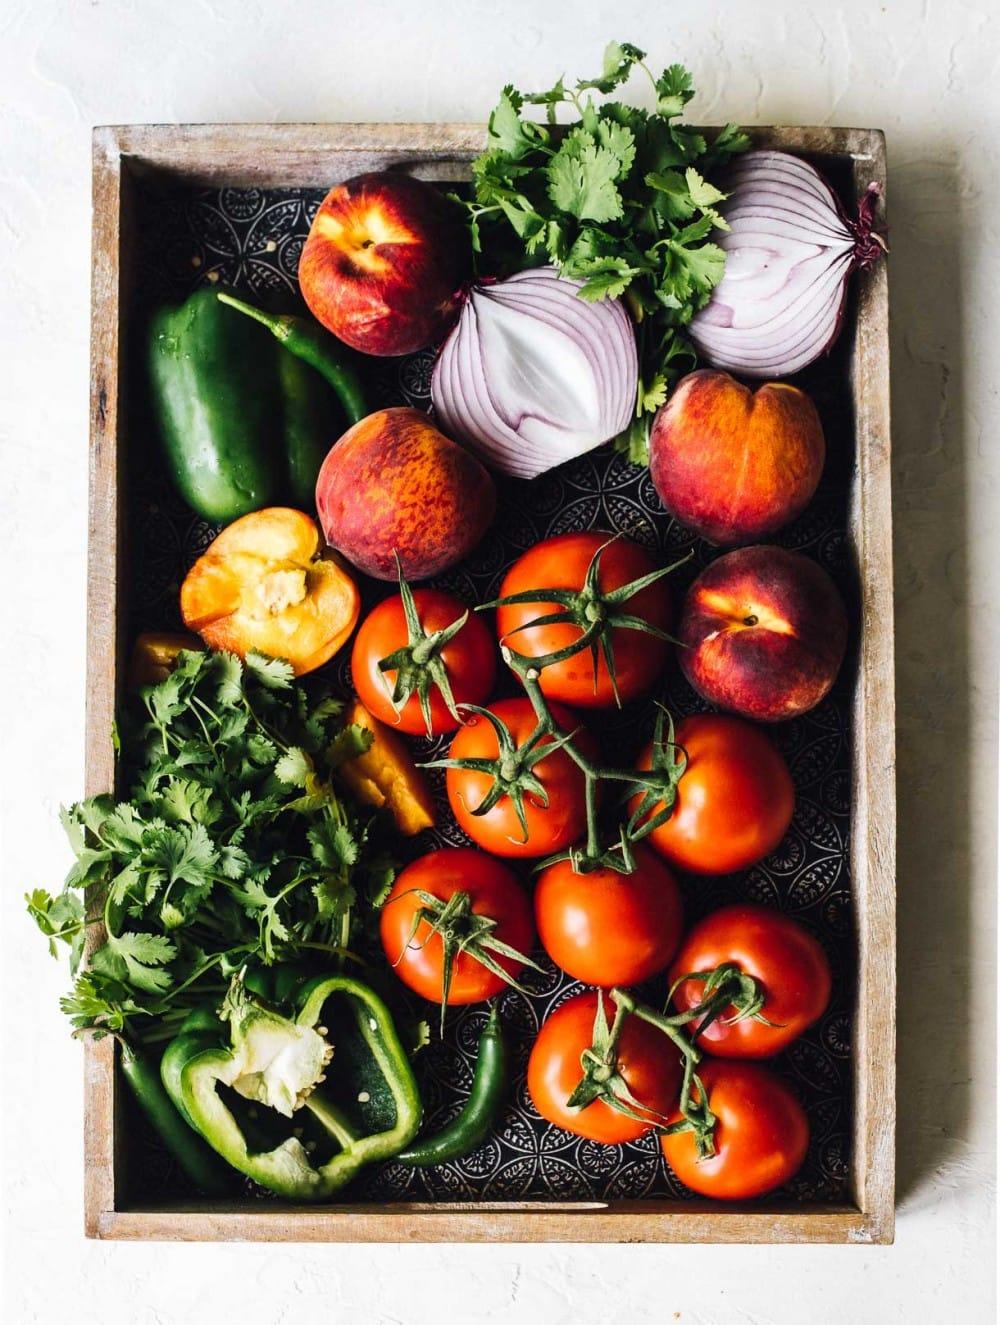 fresh tomatoes, cilantro, green pepper, onions, peaches on a tray, overhead photo